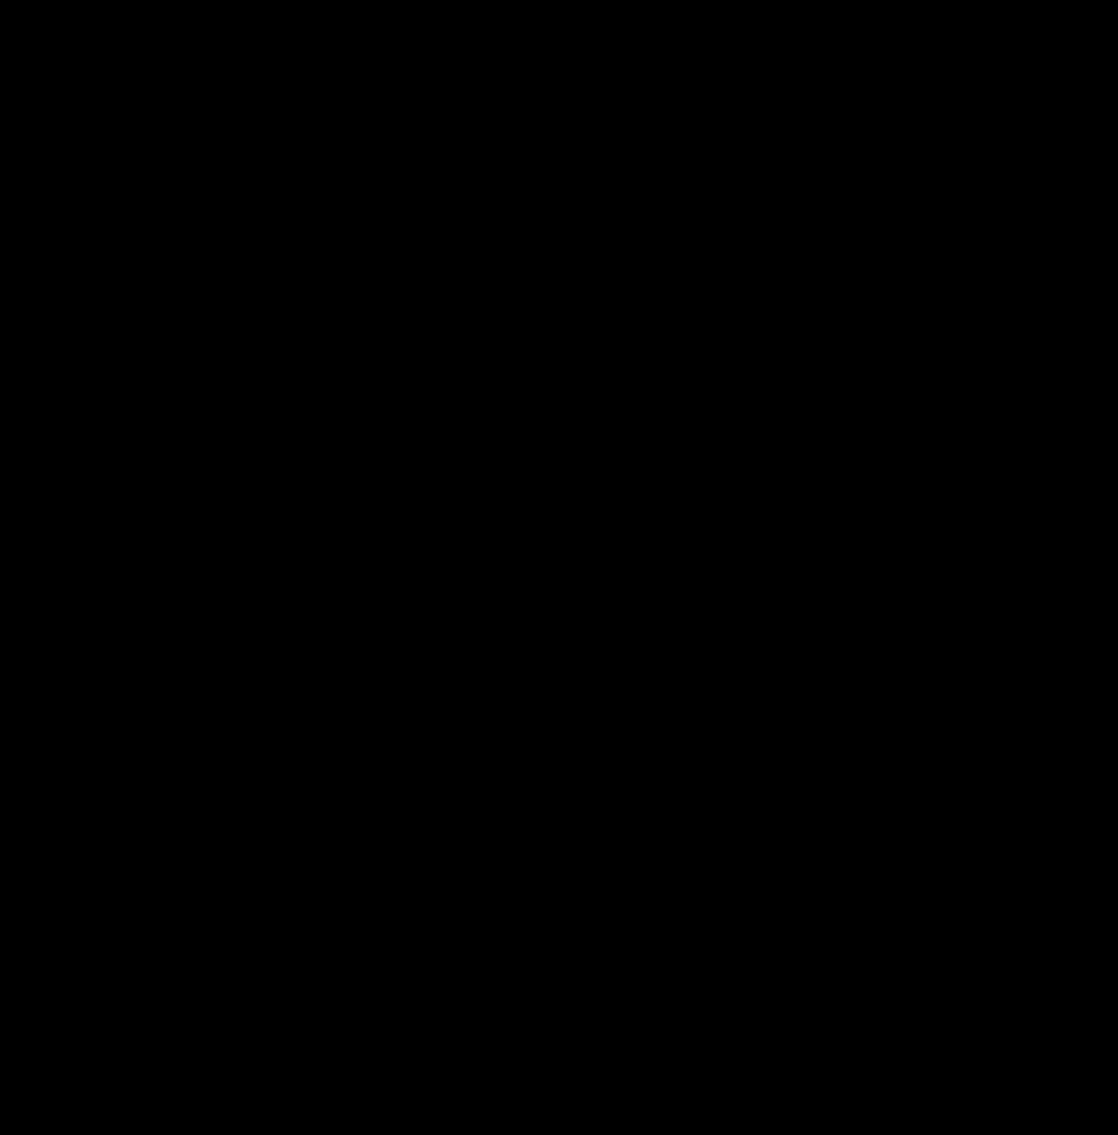 Planet Clipart - Clip Art - Png Download (1118x1135), Png Download